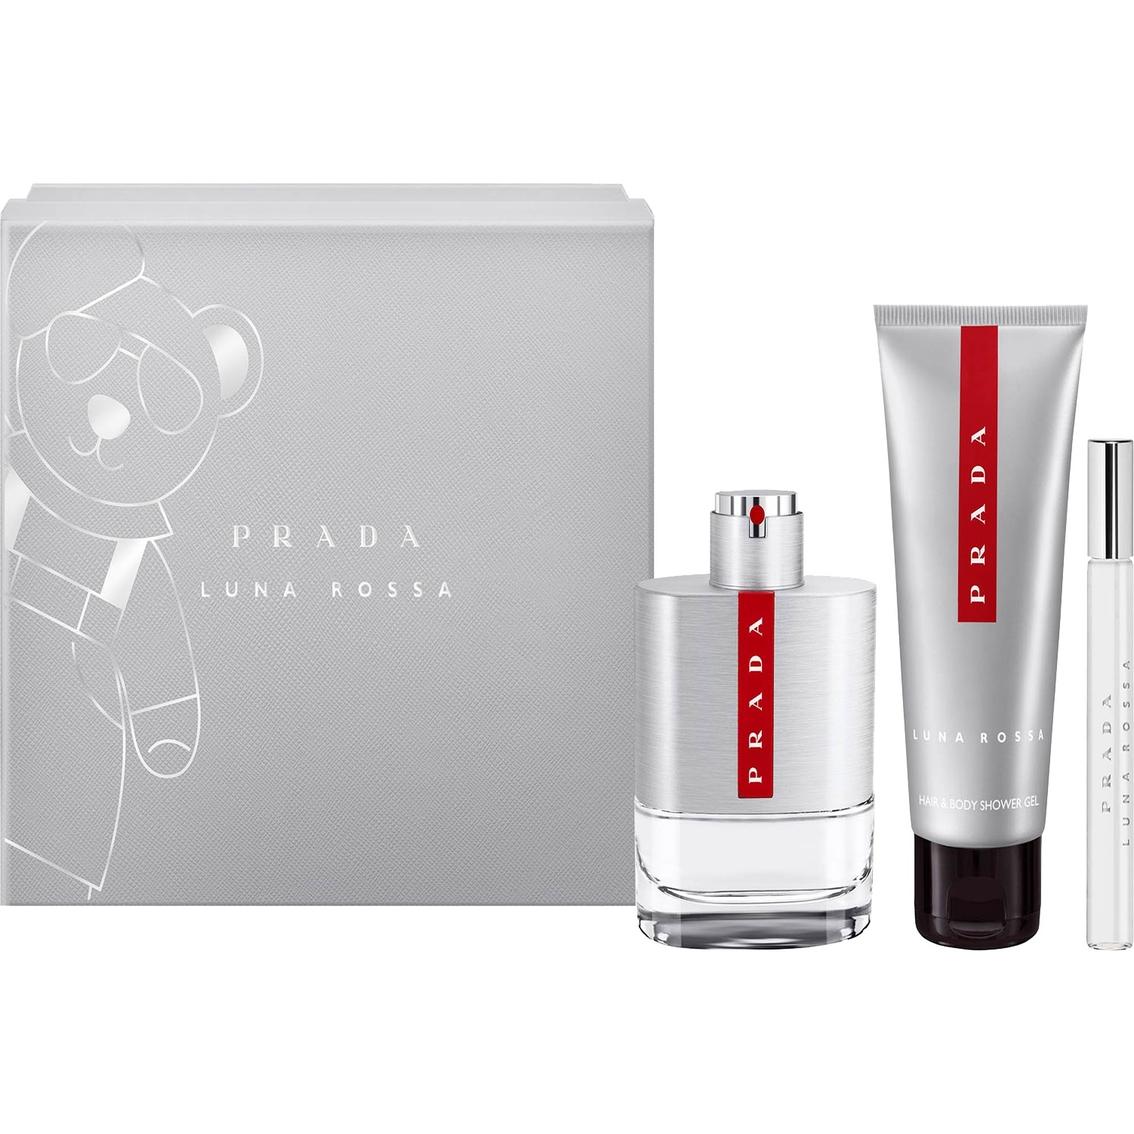 a5edffd8c5e3 Prada Luna Rossa Classic Men's Set   Gifts Sets For Him   Beauty ...